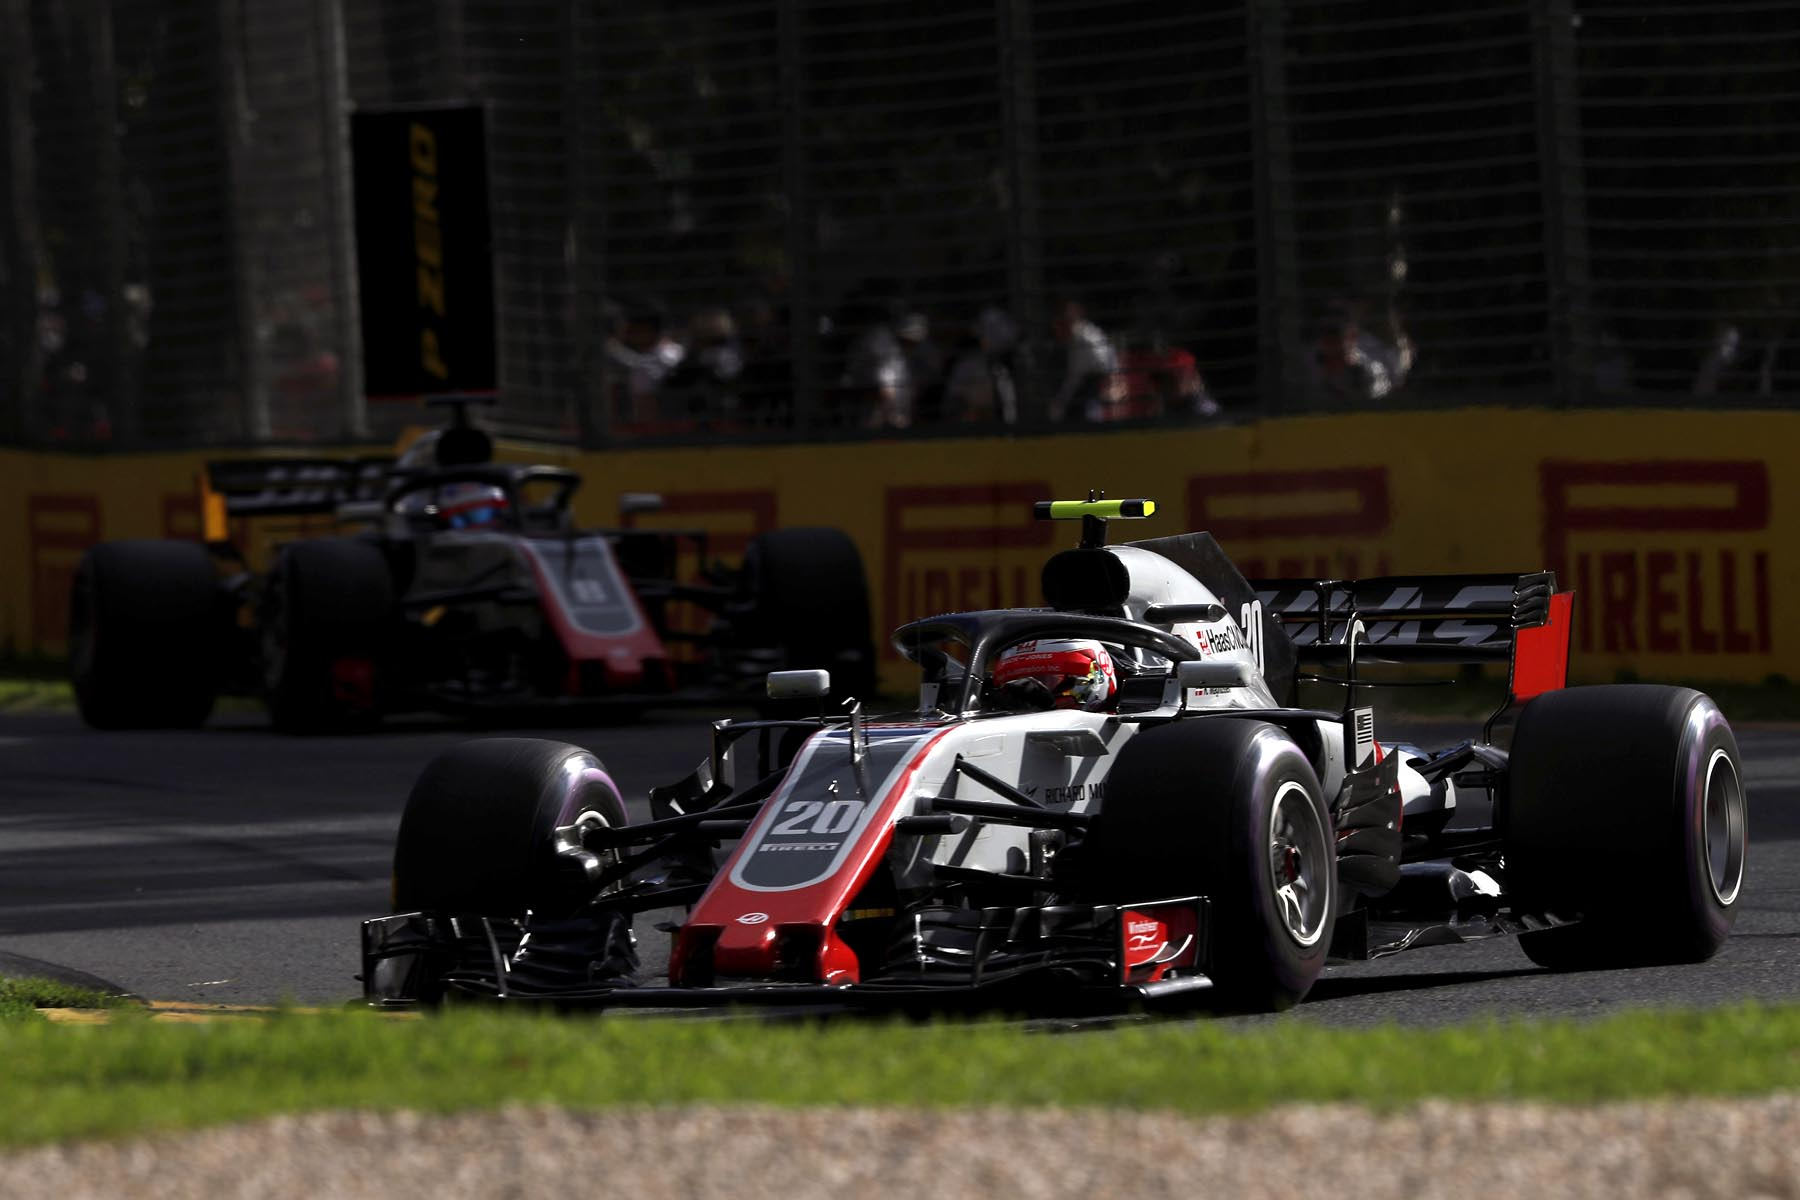 Romain Grosjean and Kevin Magnuseen on track at the 2018 Australian Grand Prix.